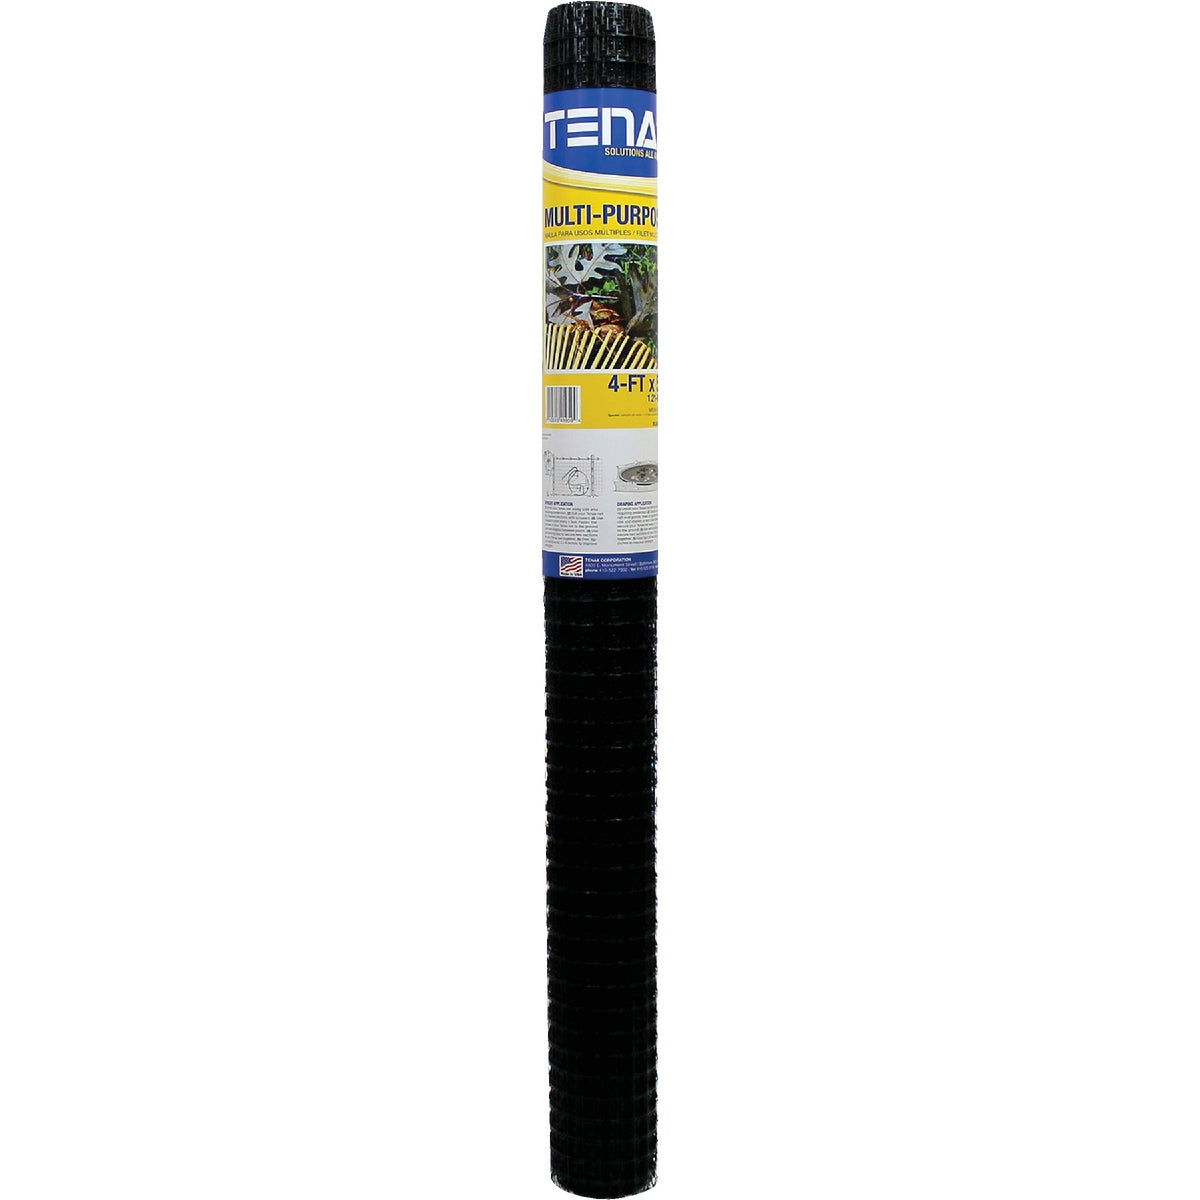 4X50 BLK MULTI NET - 419594 by Tenax Corporation